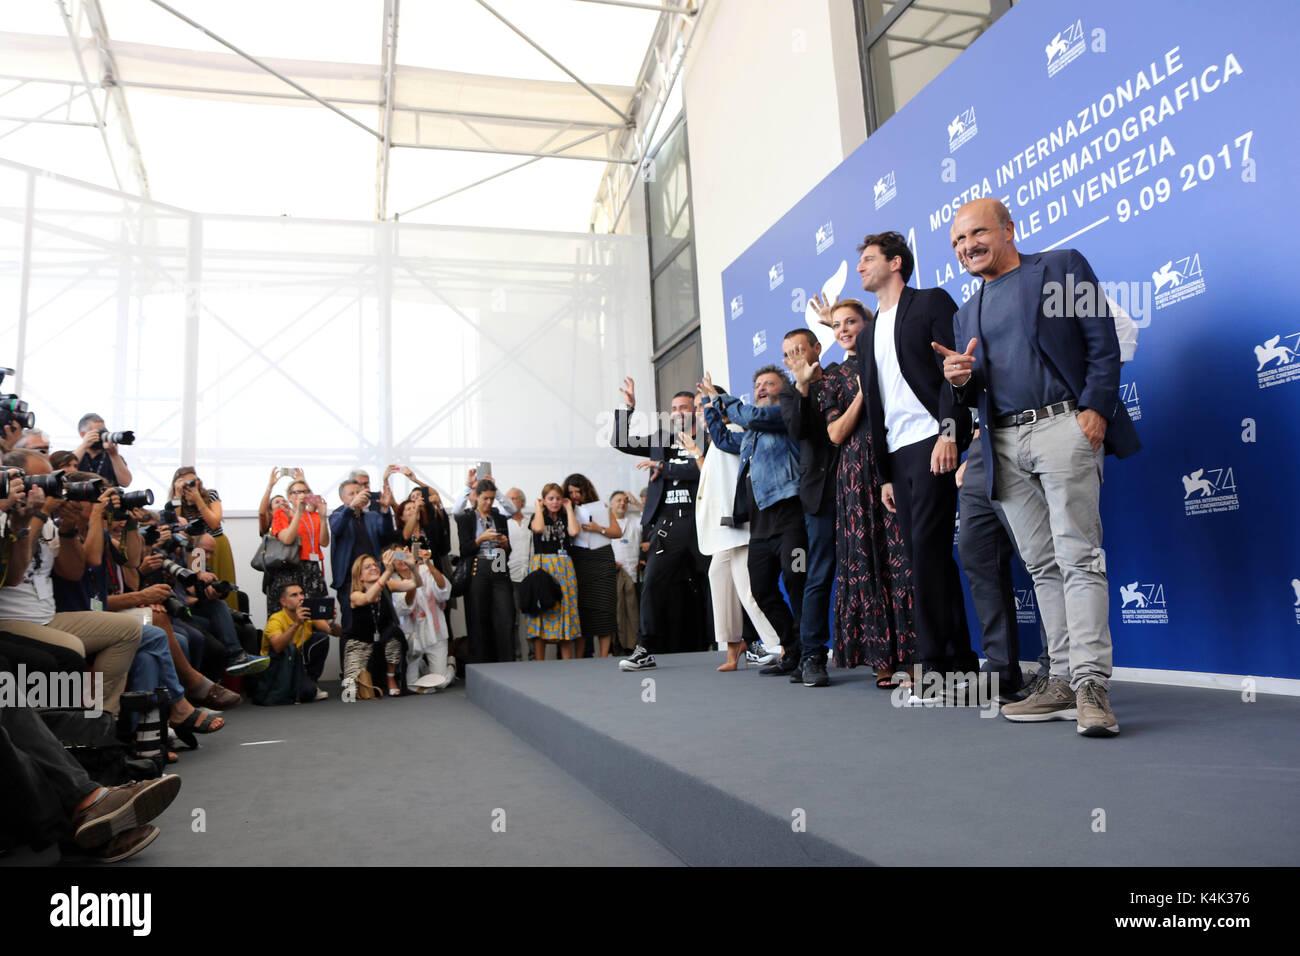 Lido Di Venezia, Italy. 06th Sep, 2017. Europe, Italy, Lido di Venezia, 06 september, 2017 : the cast of movie 'Ammore - Stock Image